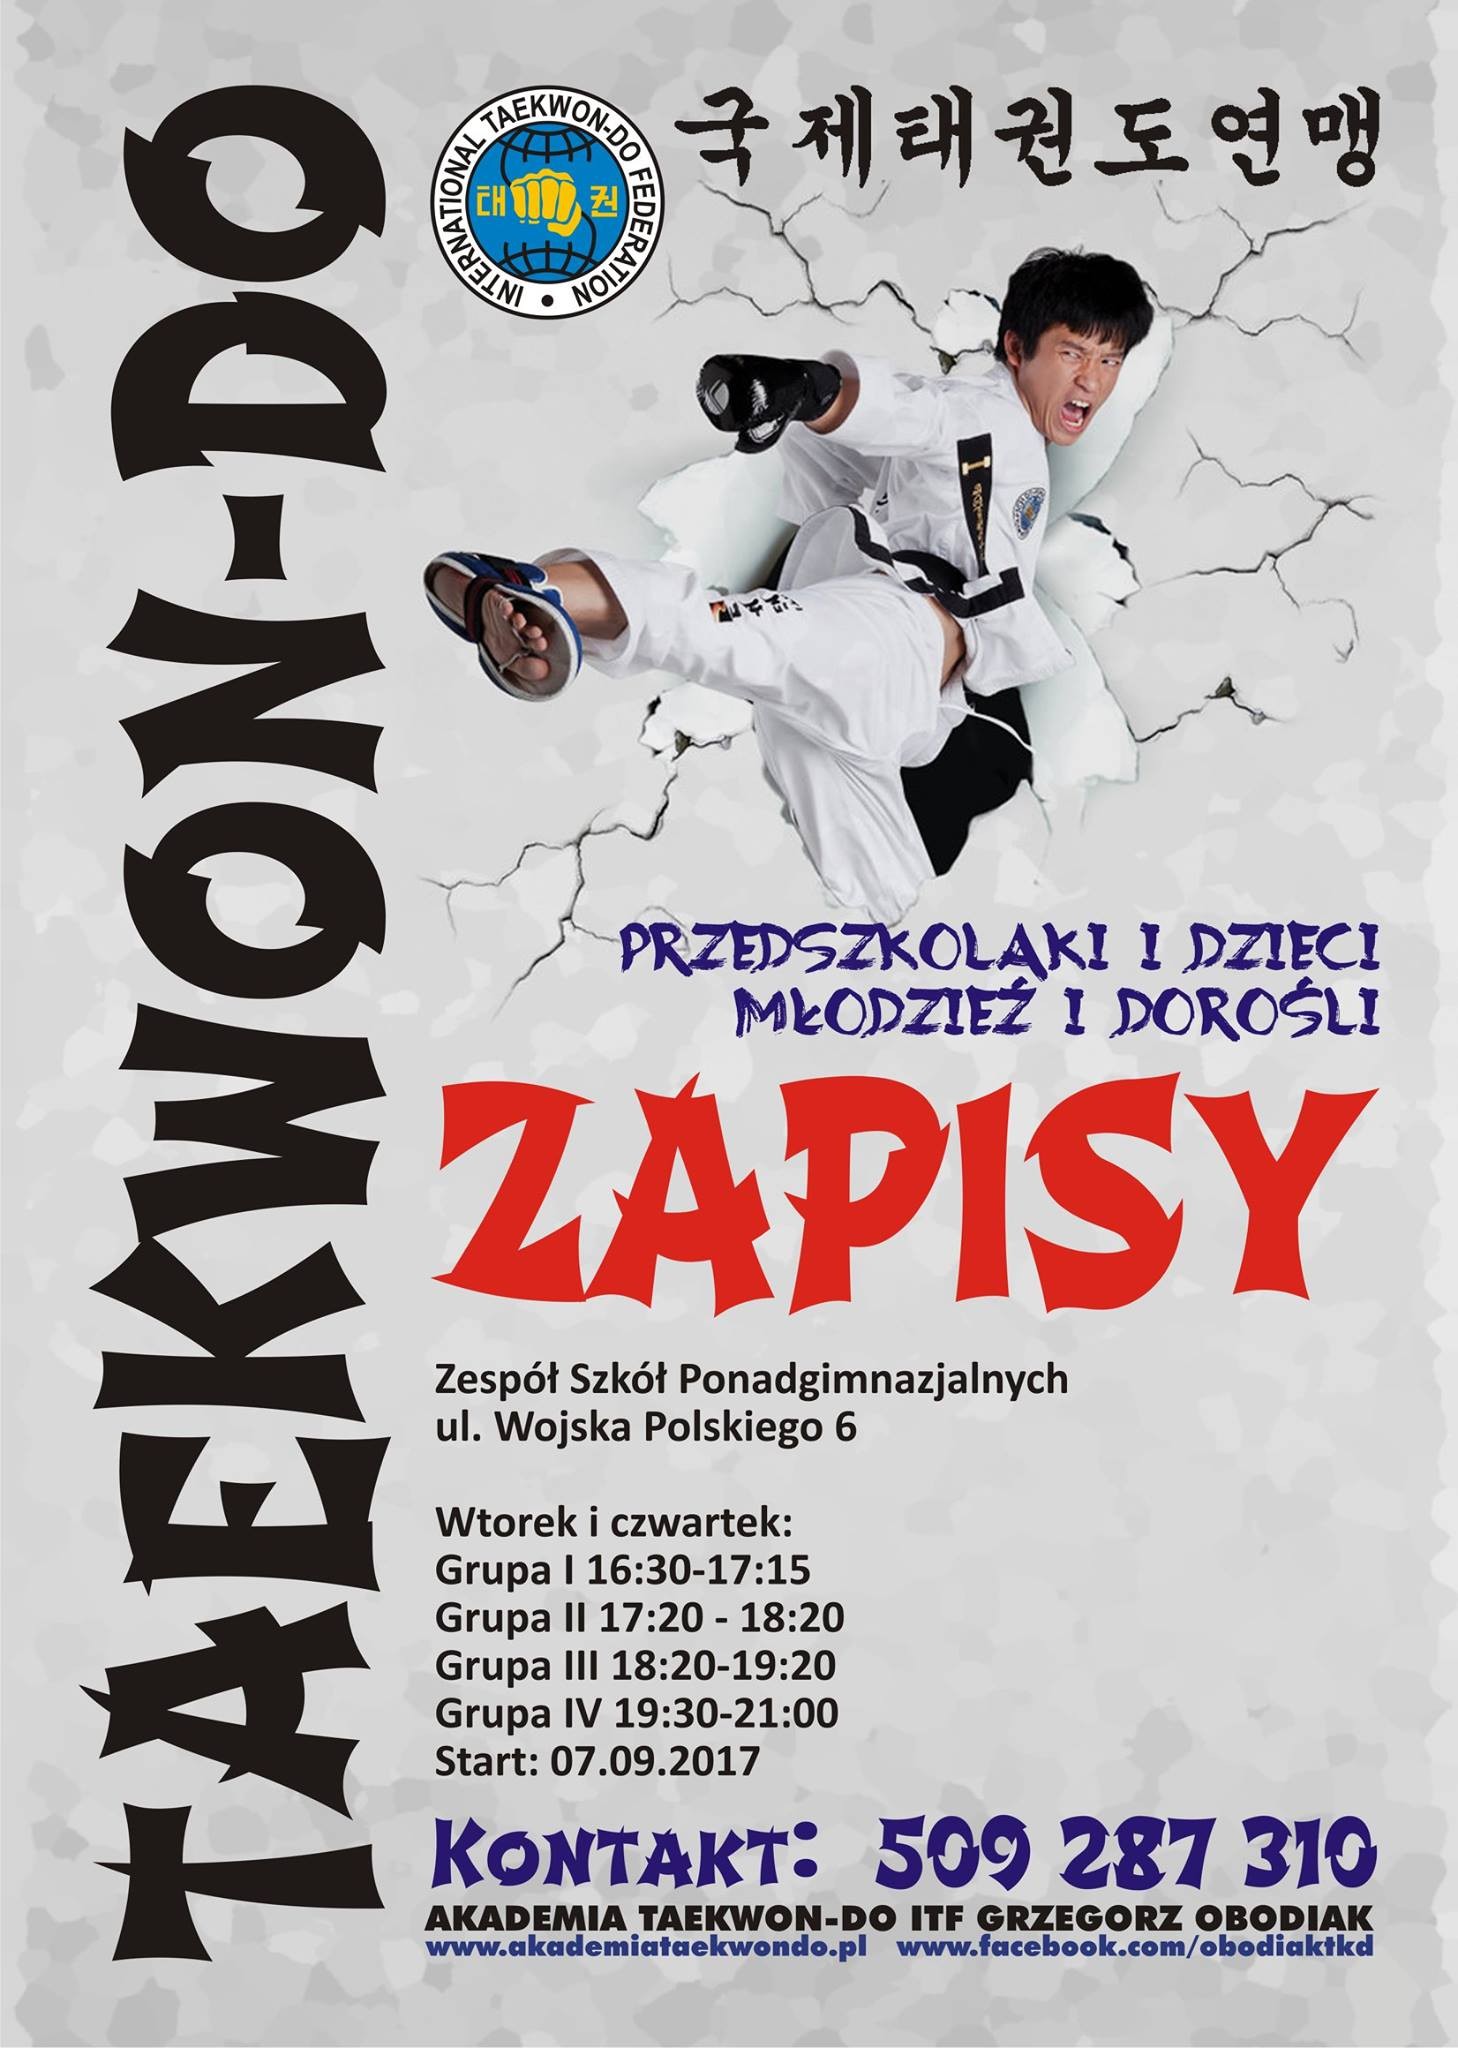 nowy sezon taekwondo 2018